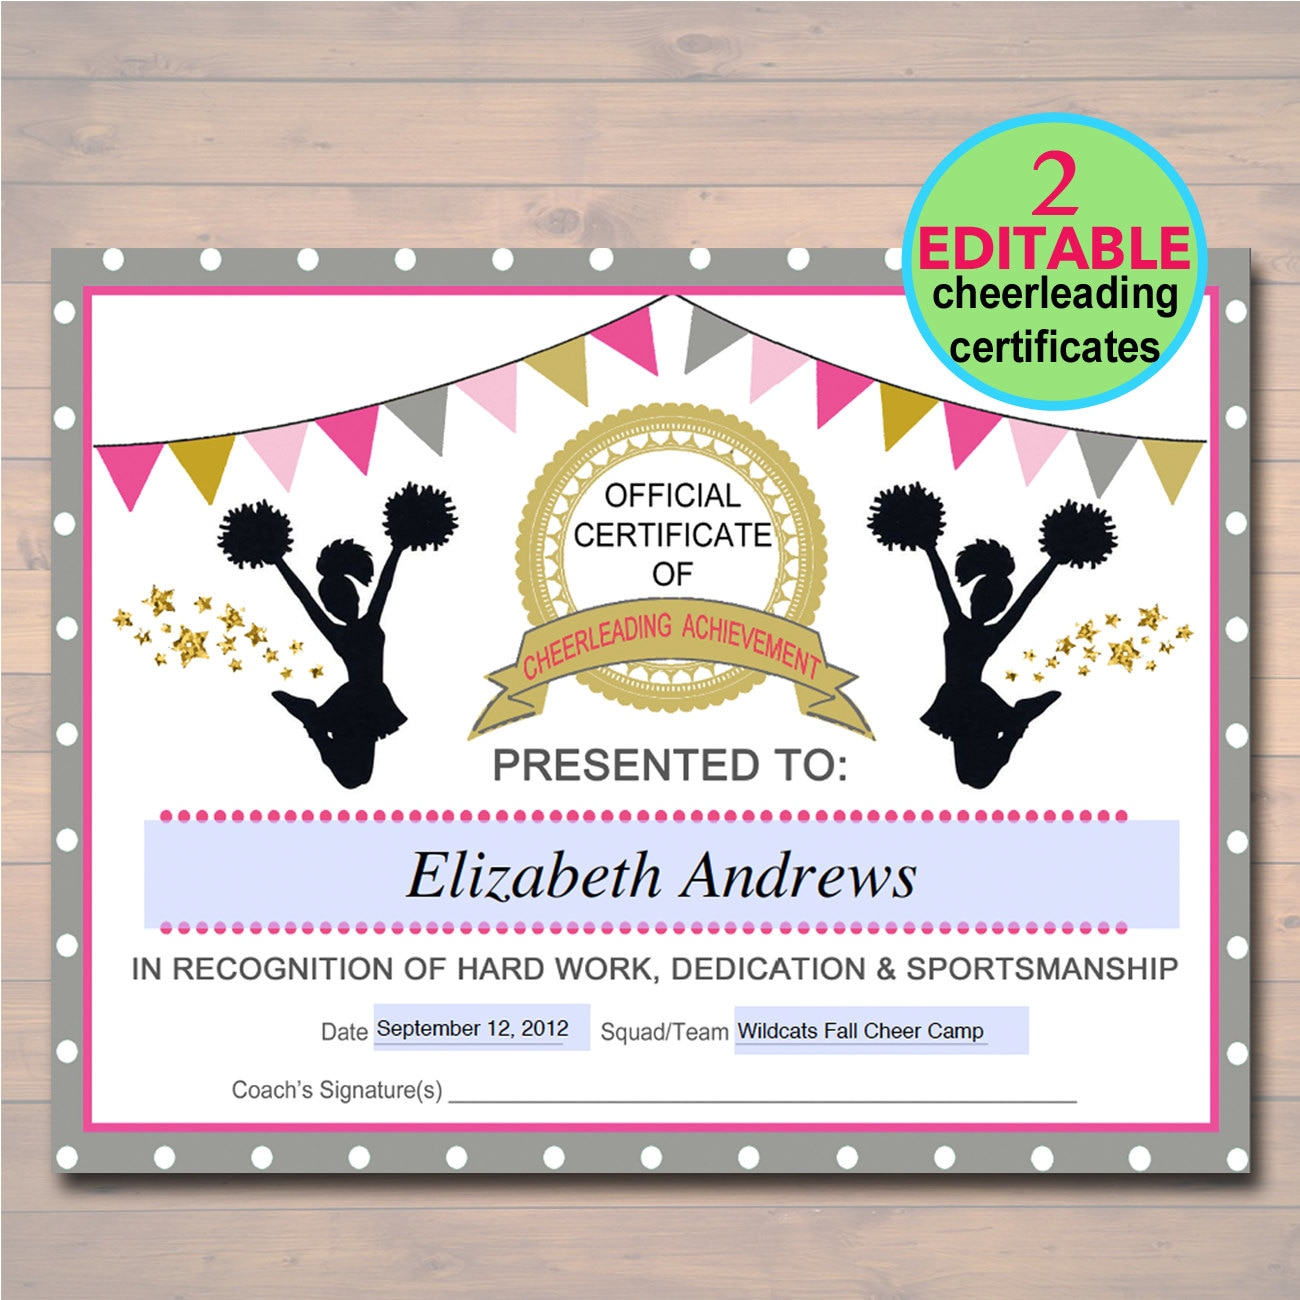 cheerleading award certificate  EDITABLE Cheerleader Certificate INSTANT DOWNLOAD